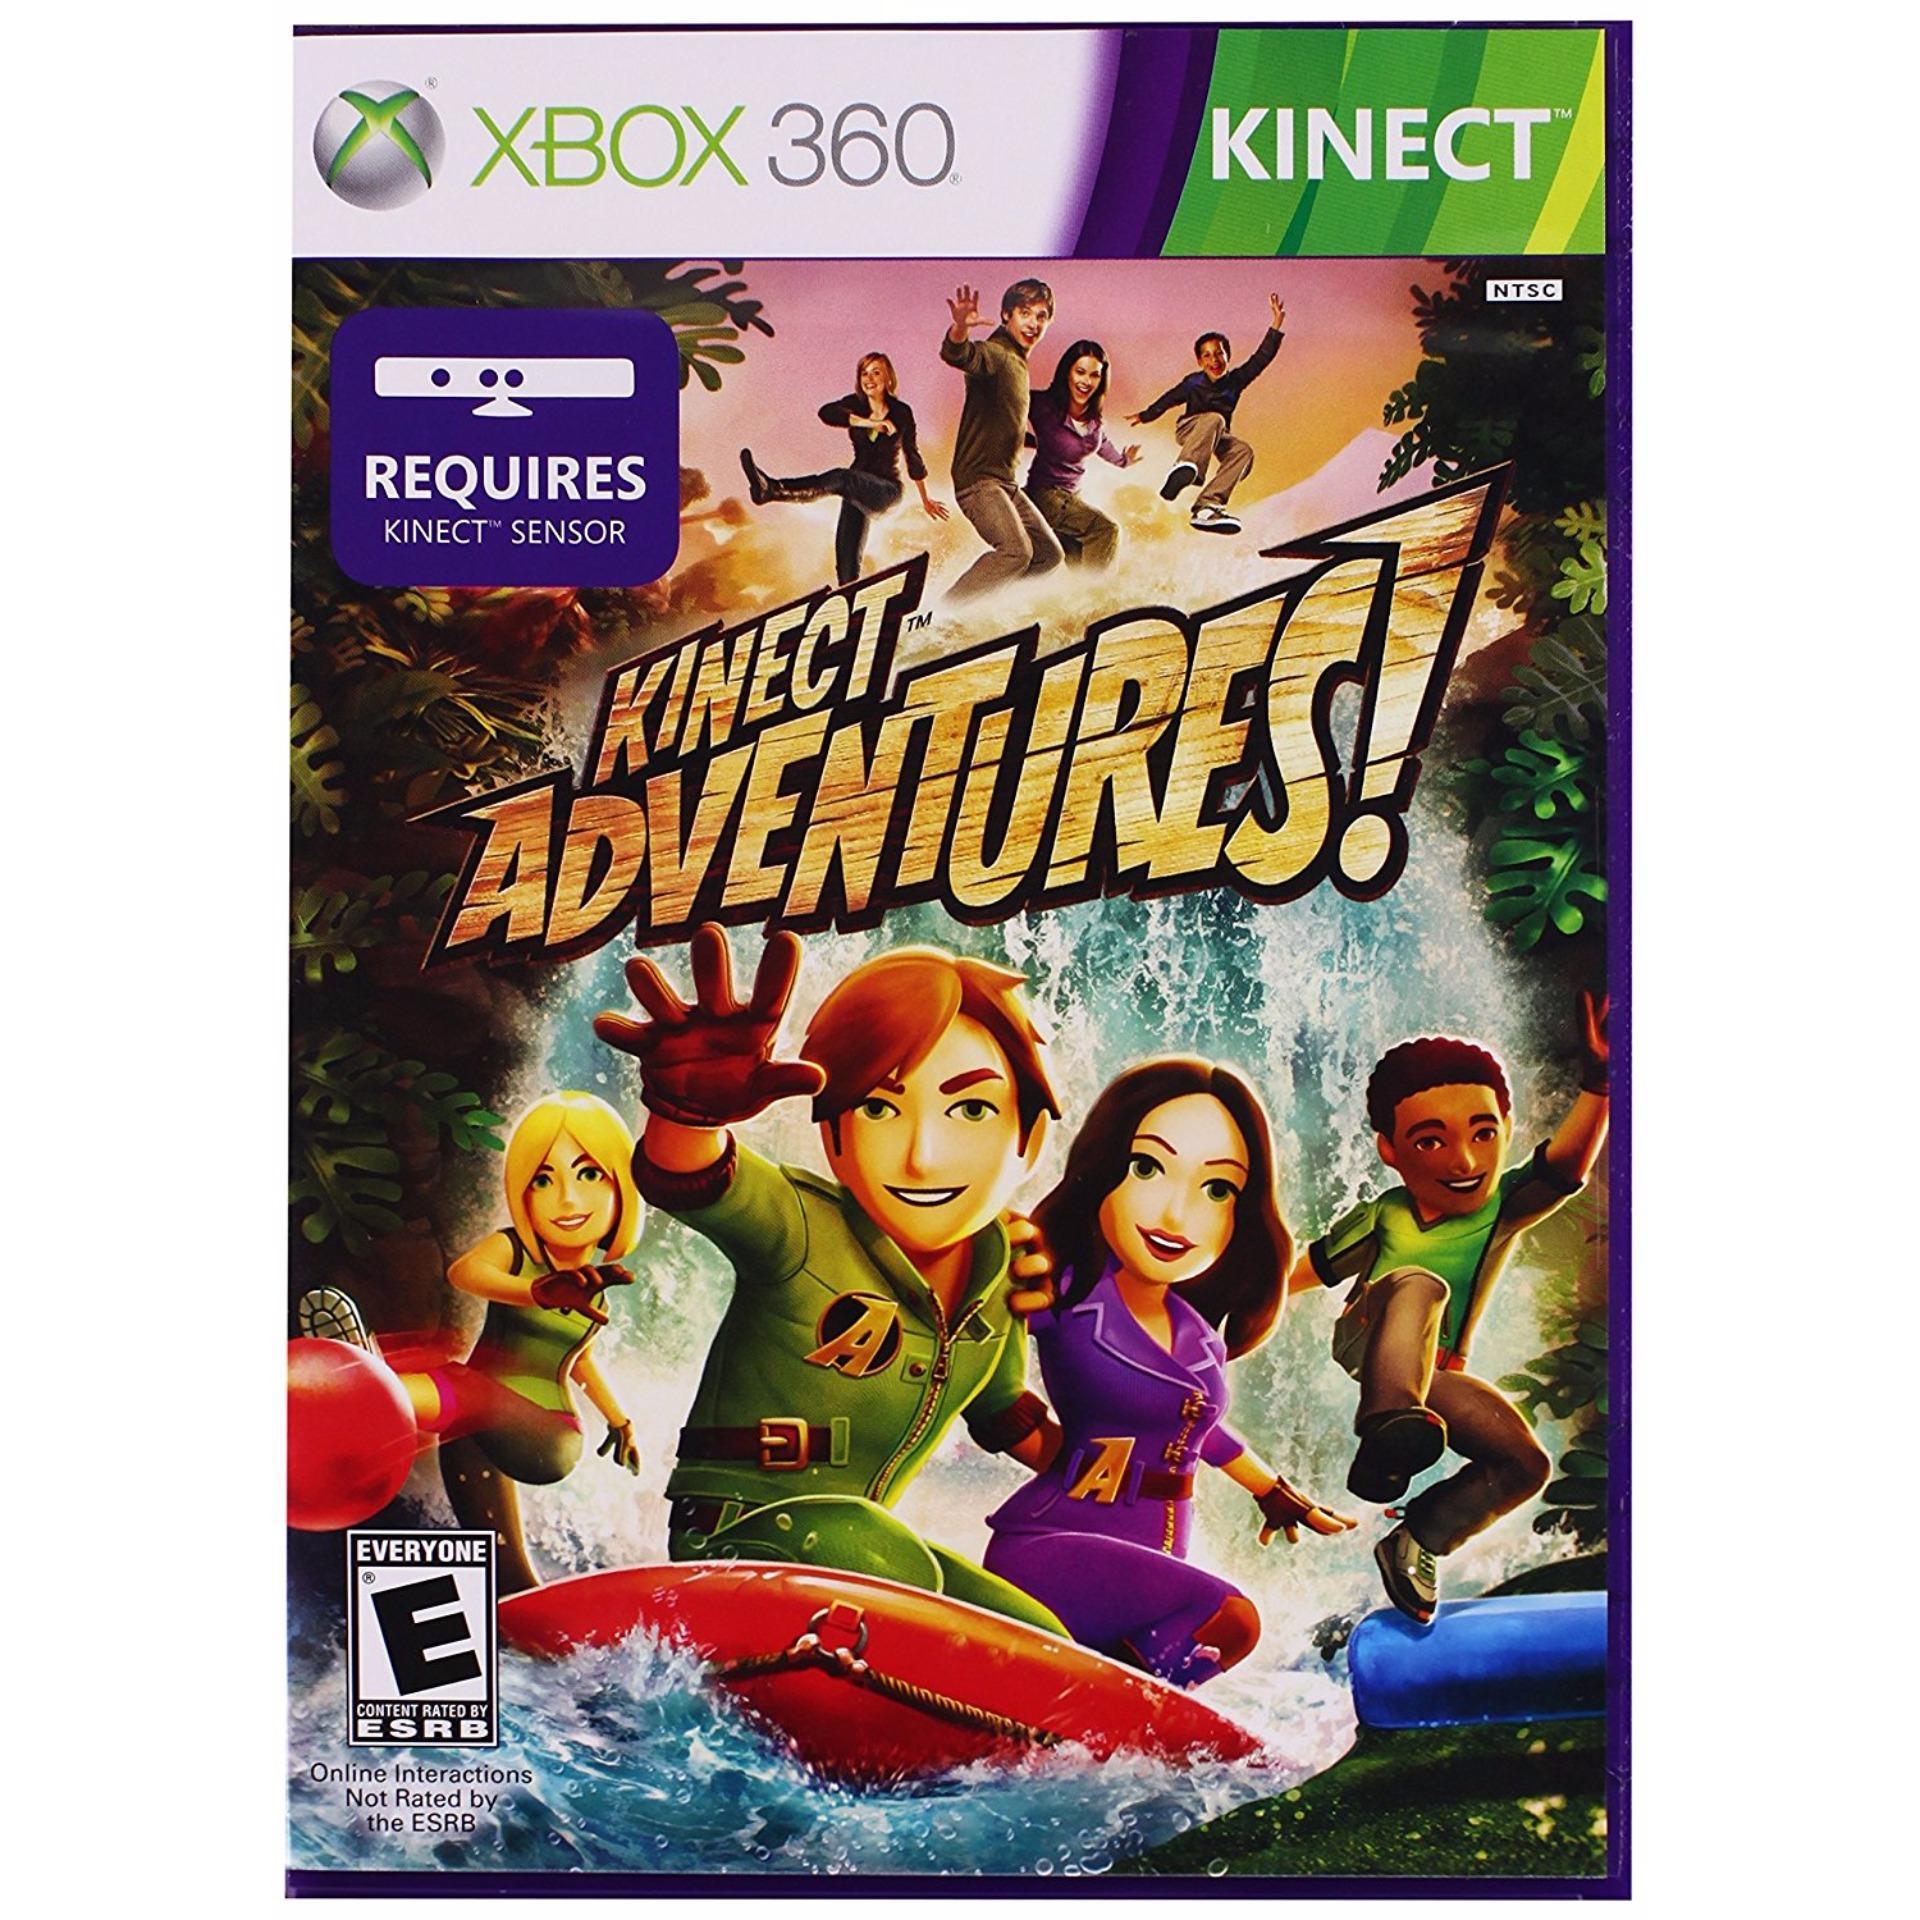 Chỗ bán Game Xbox 360 Kinect Adventures (NTSCJ)